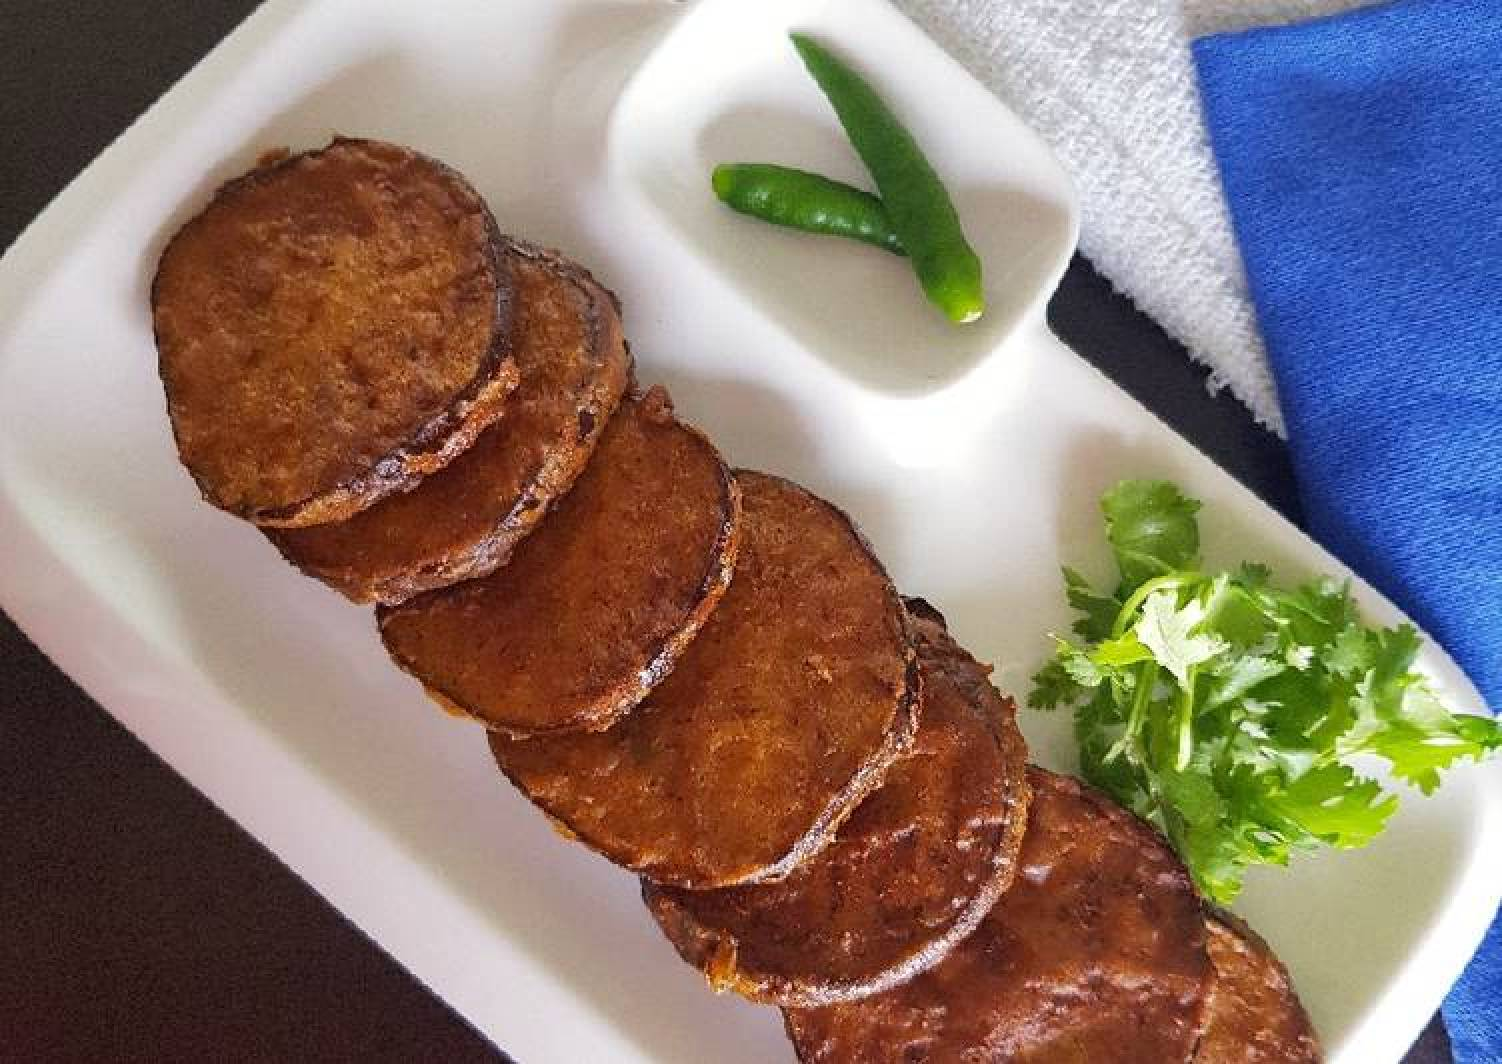 Eggplant fry/ Baigan fry/ Aubergine pan fry